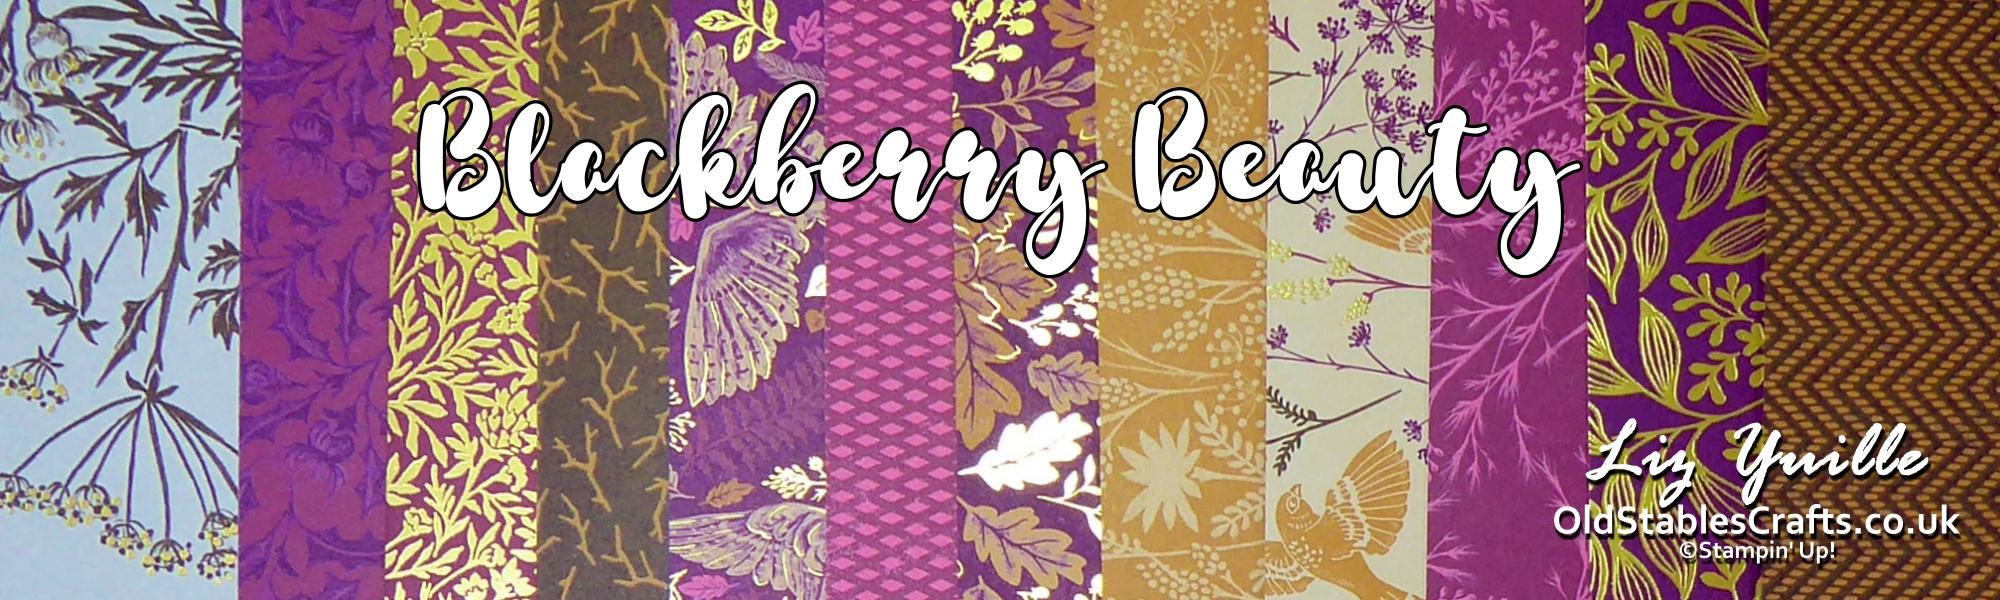 Blackberry Beauty OldStablesCrafts.co.uk